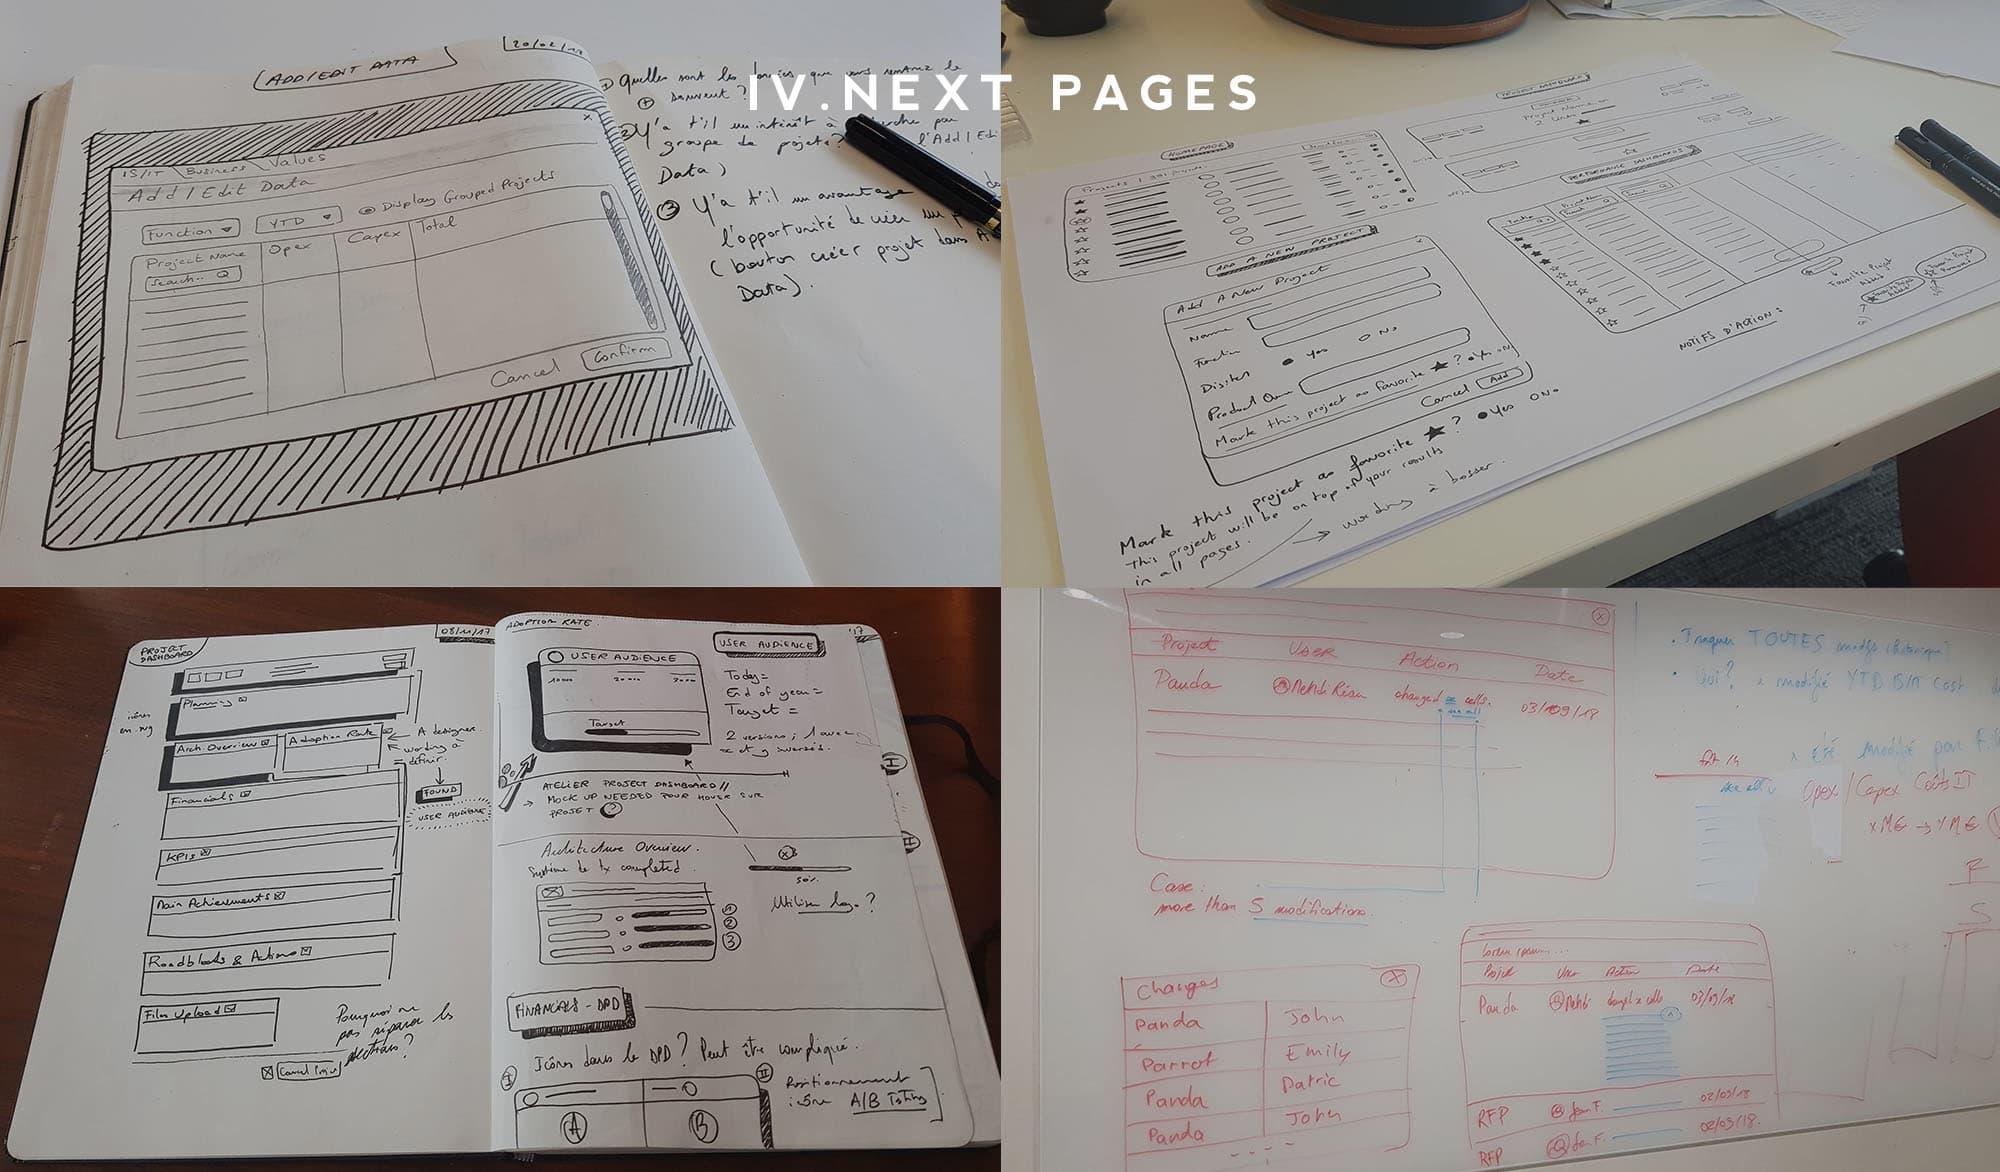 Step-IV-next-UX-pages-renault-digital